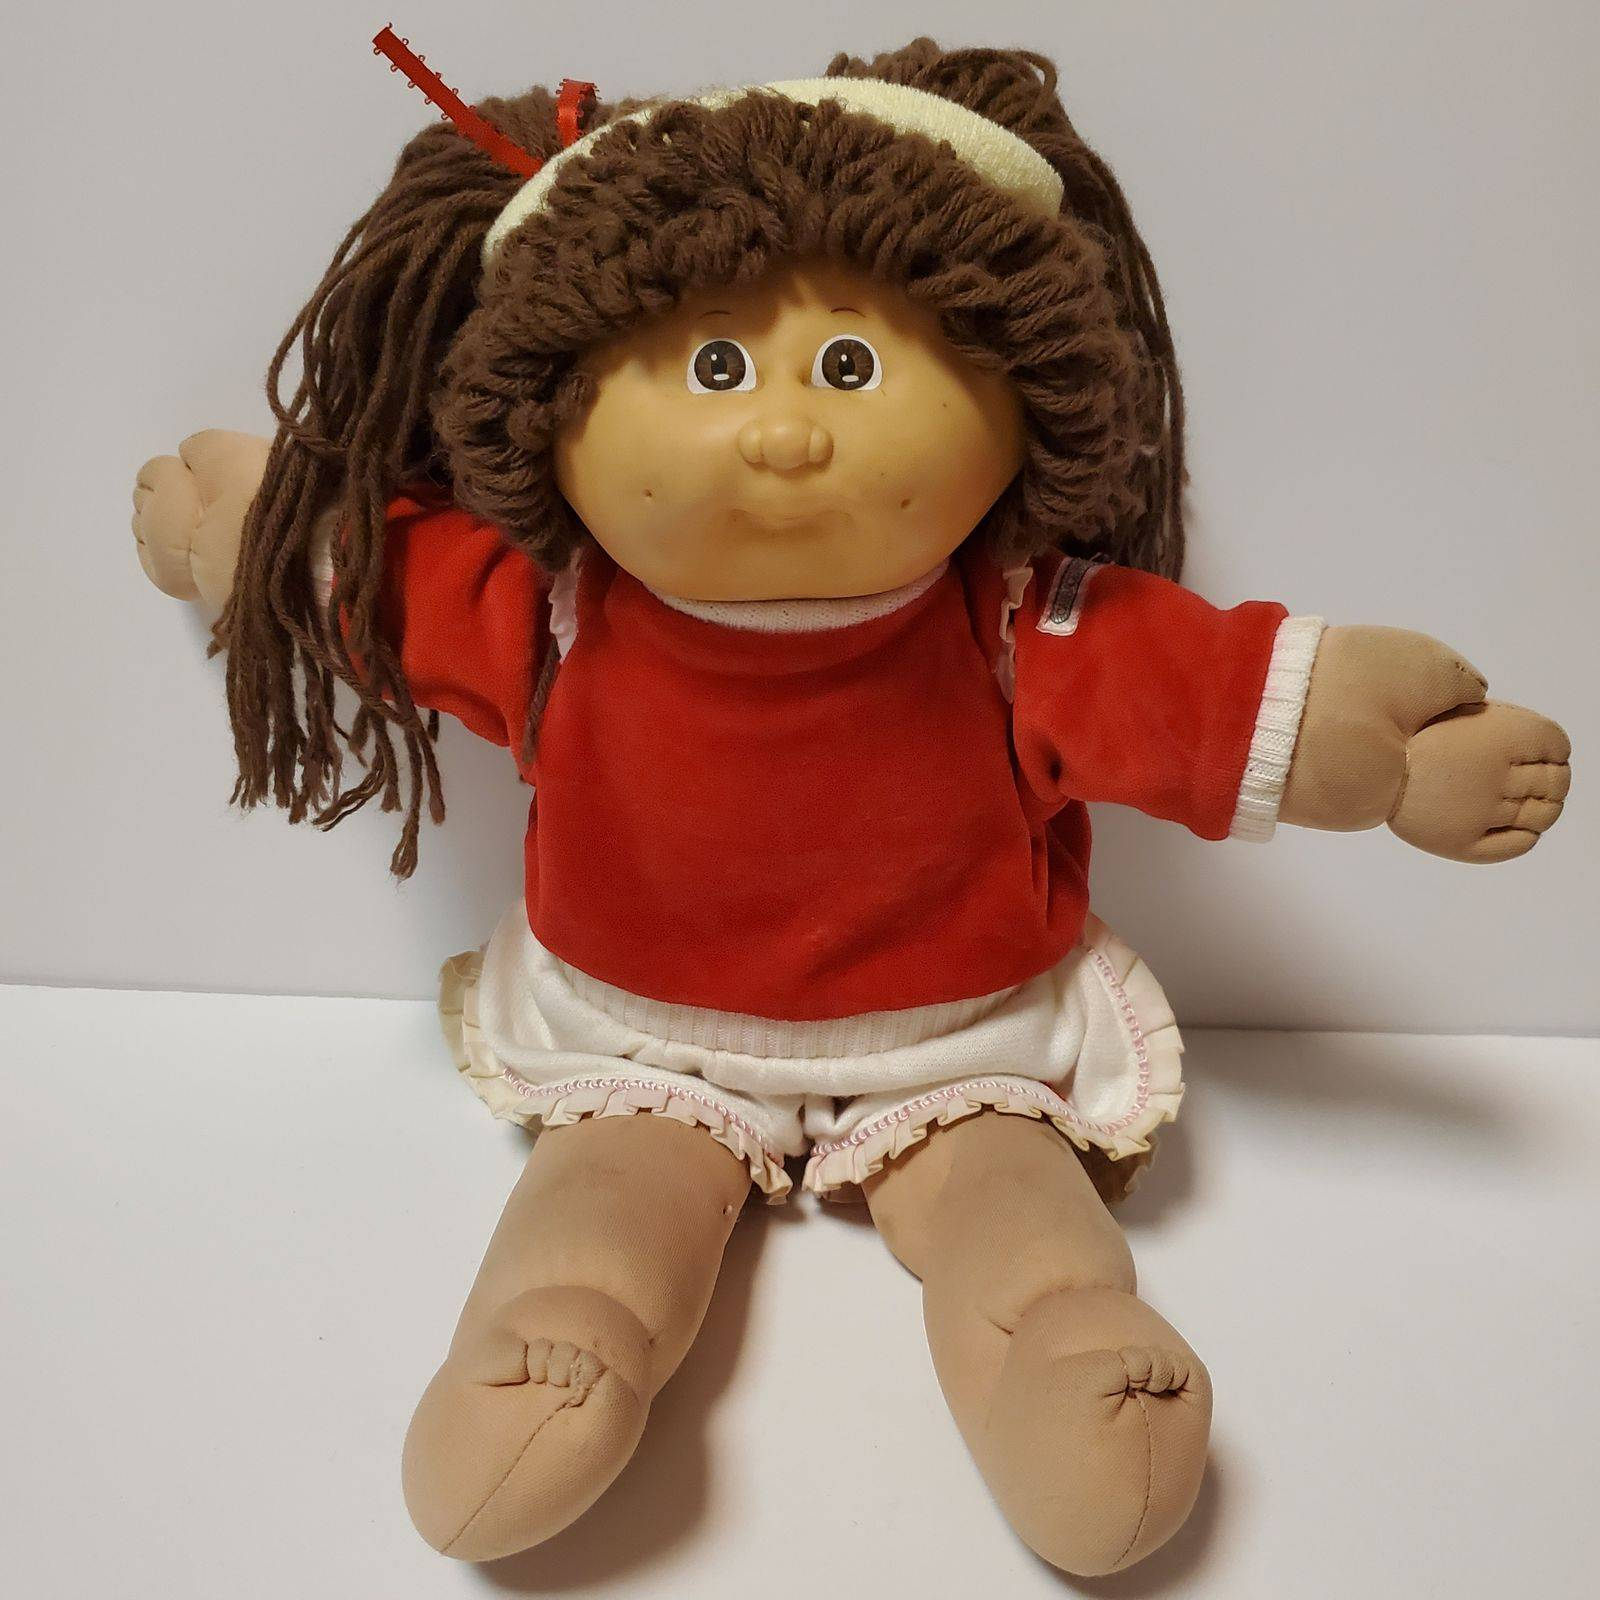 Vintage 90's Cabbage Patch Kids Doll